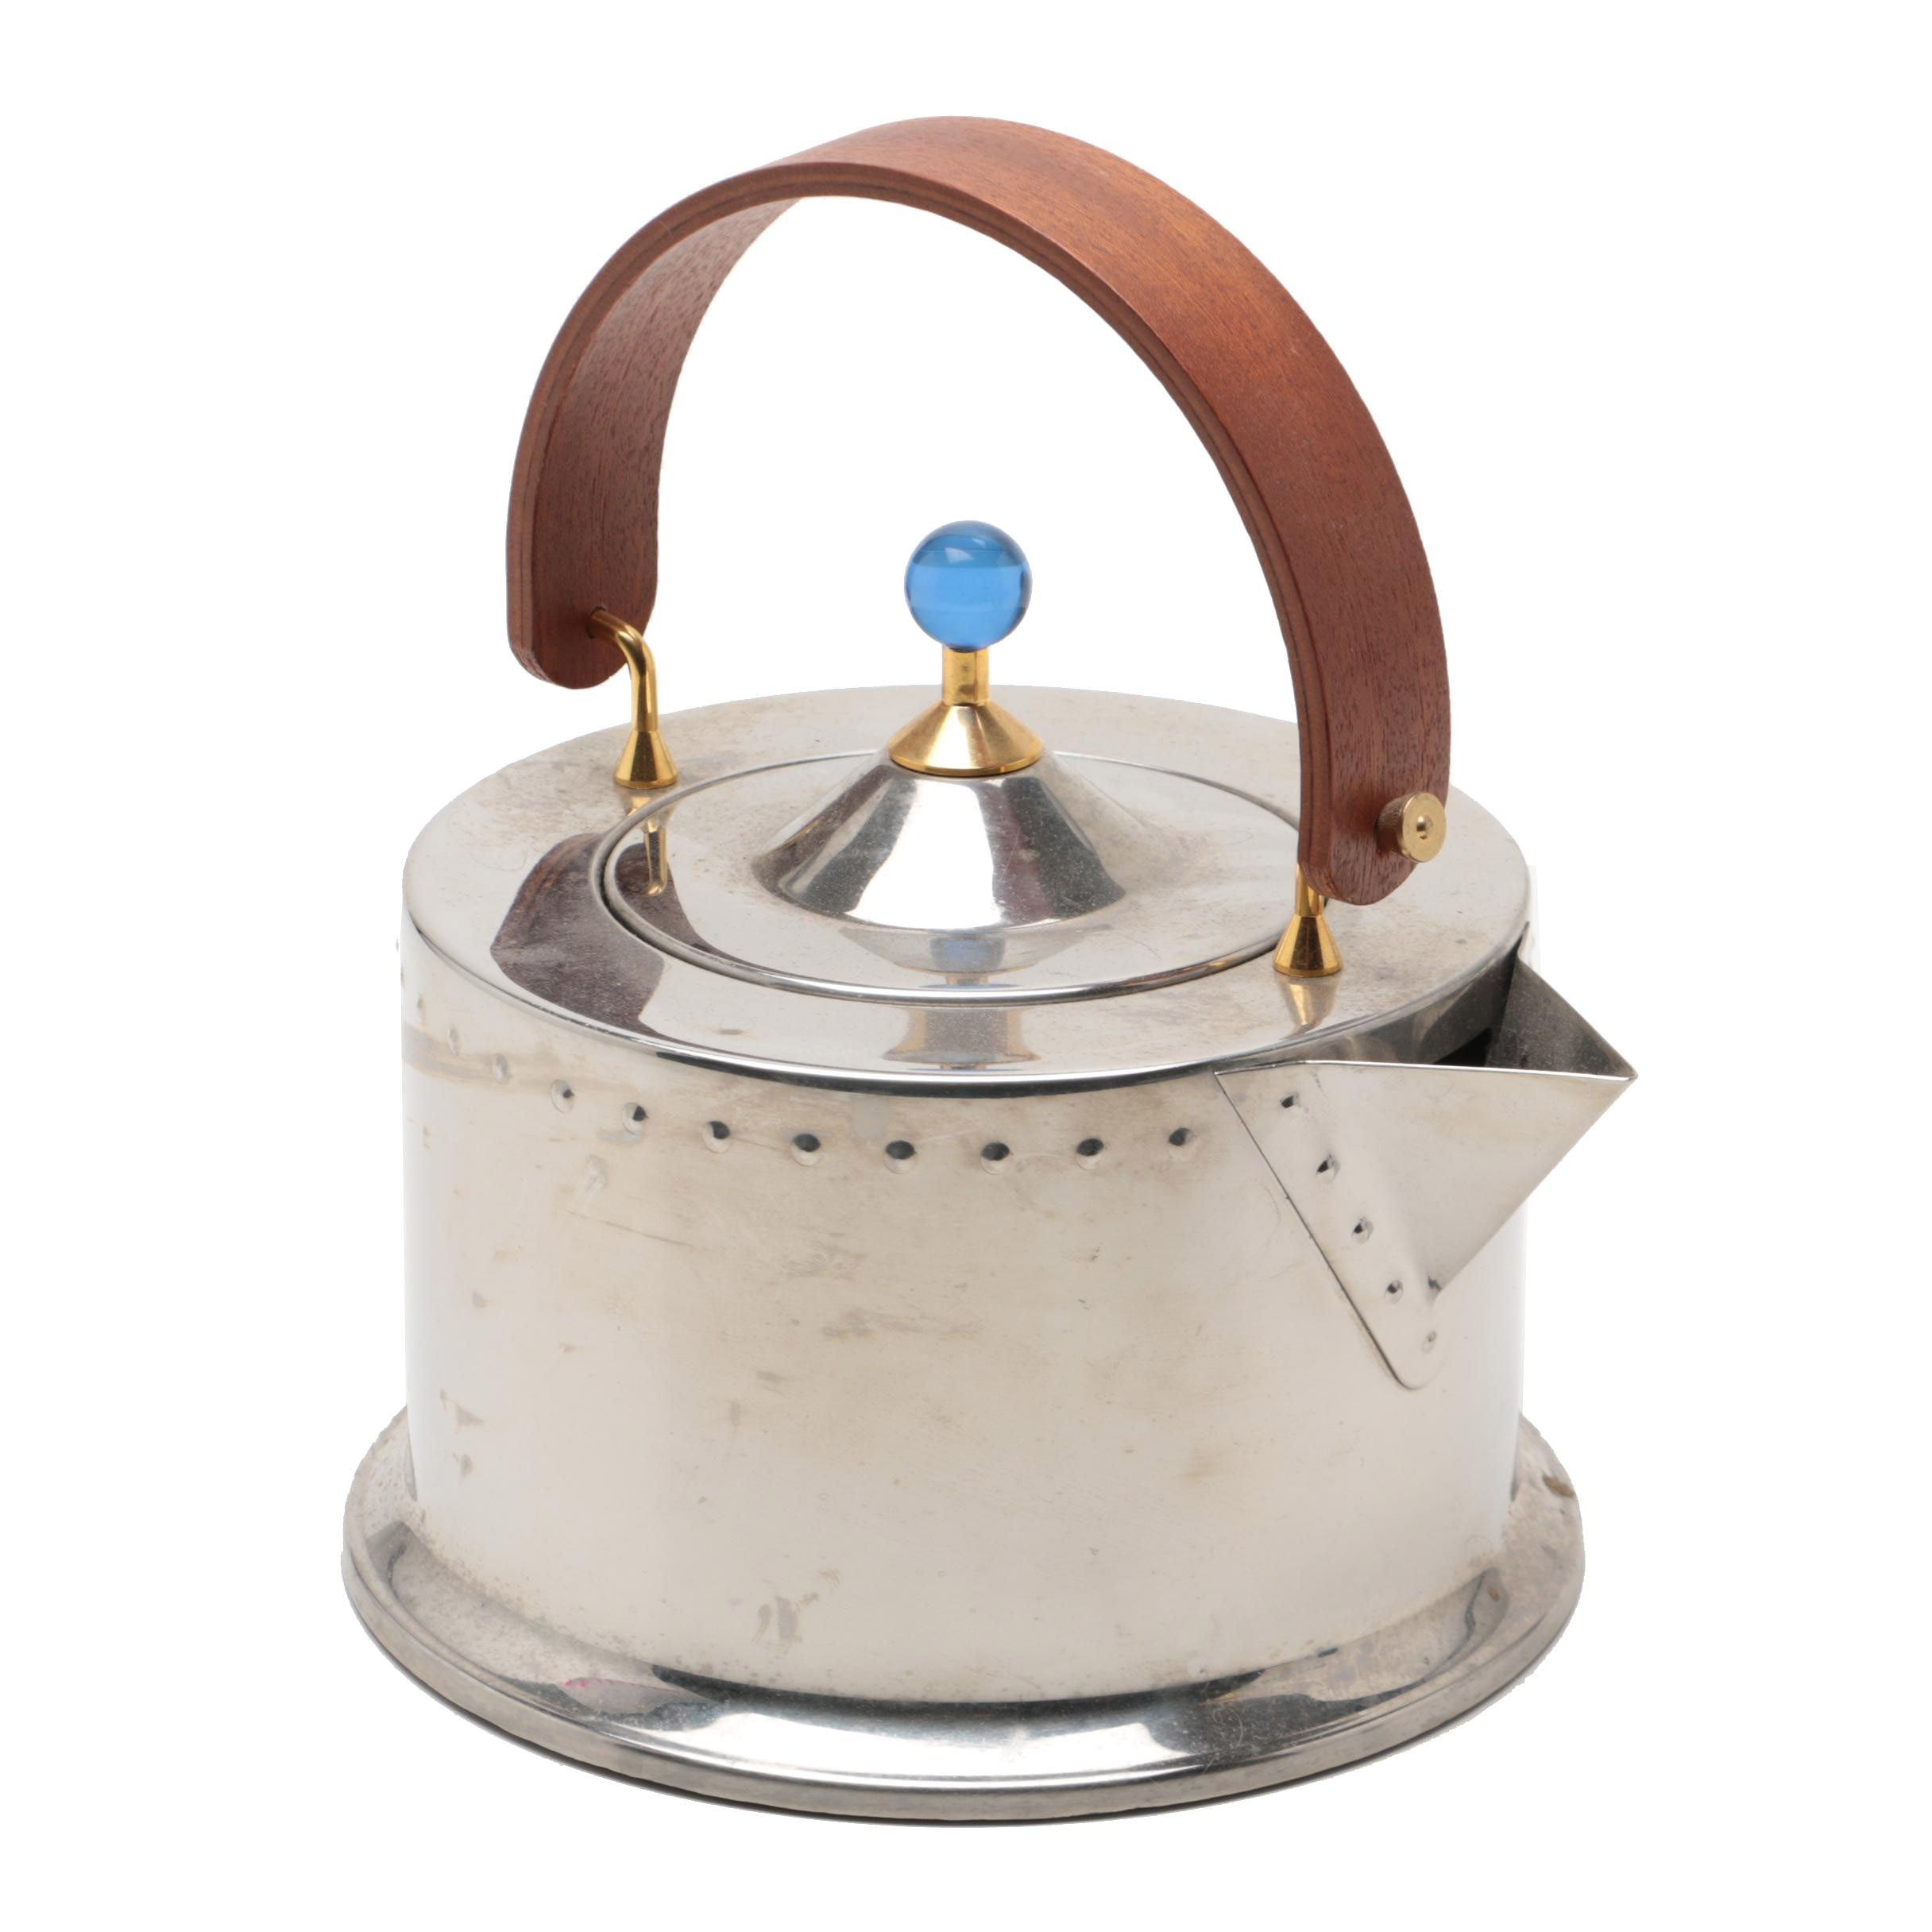 Bodum Ottoni Stainless Steel Teapot Designed by C. Jorgensen